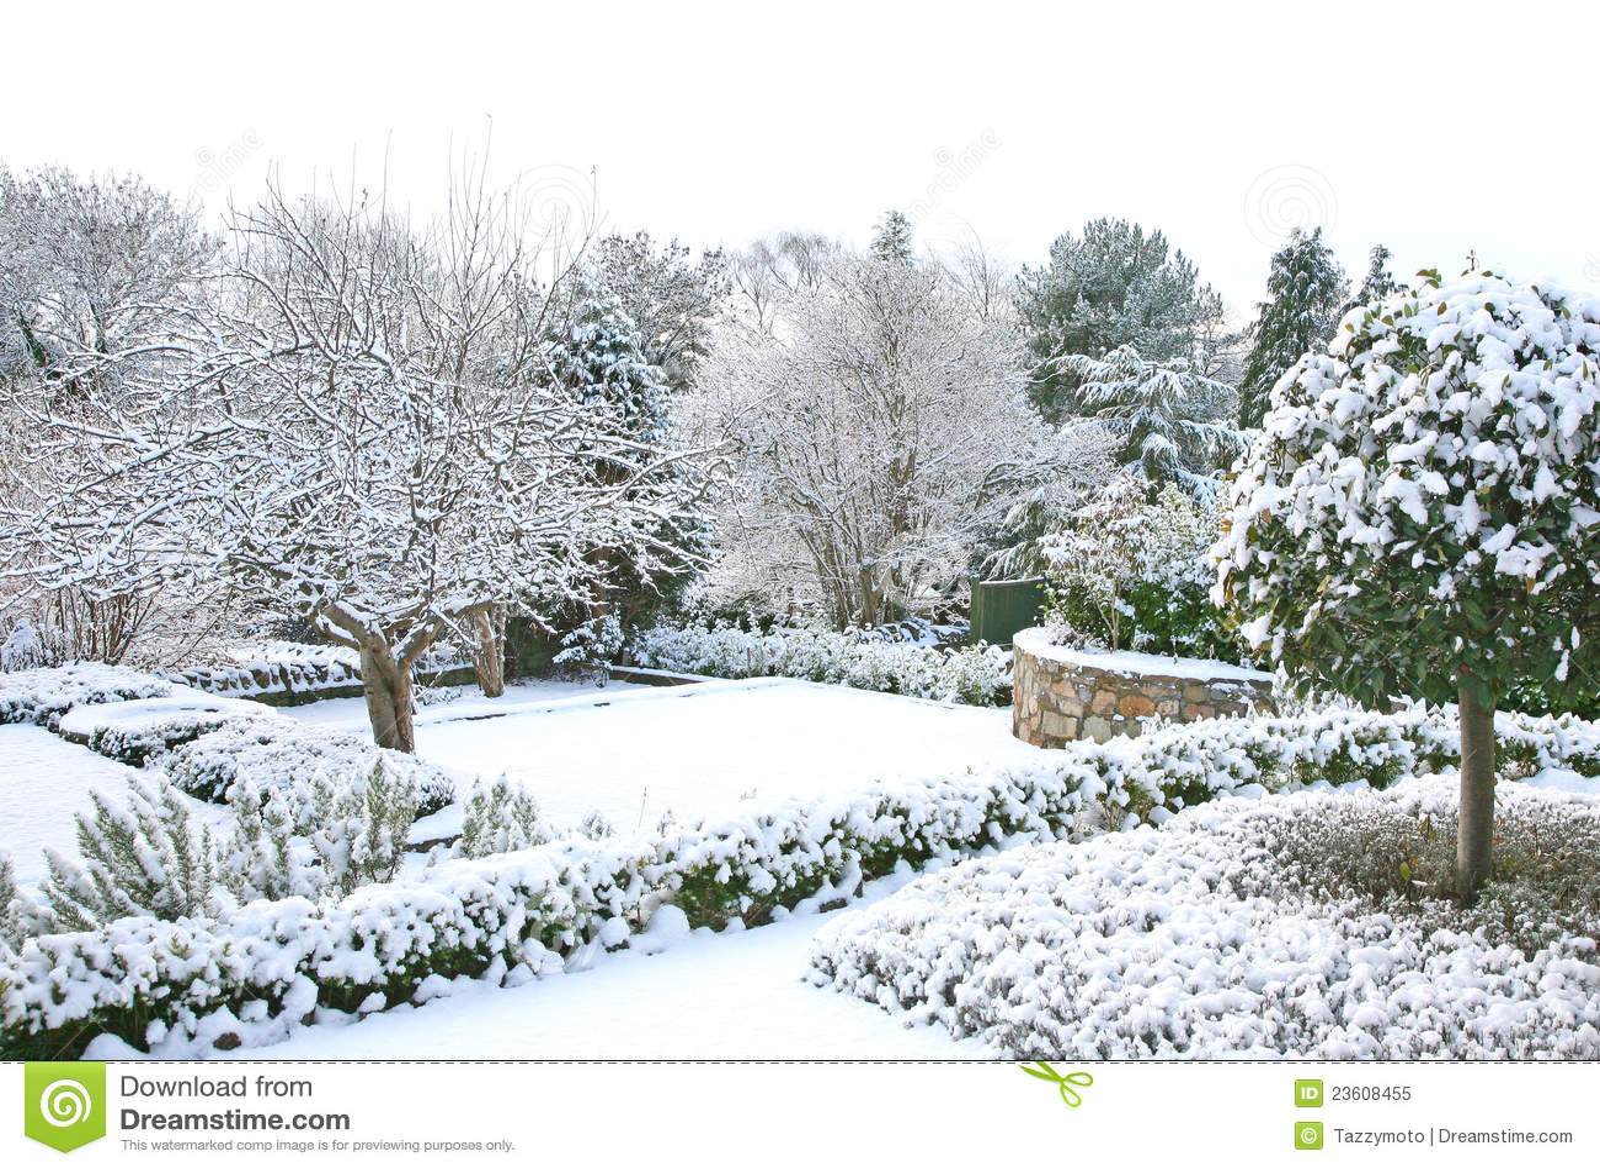 winter garden royalty free stock photo image 23608455. Black Bedroom Furniture Sets. Home Design Ideas